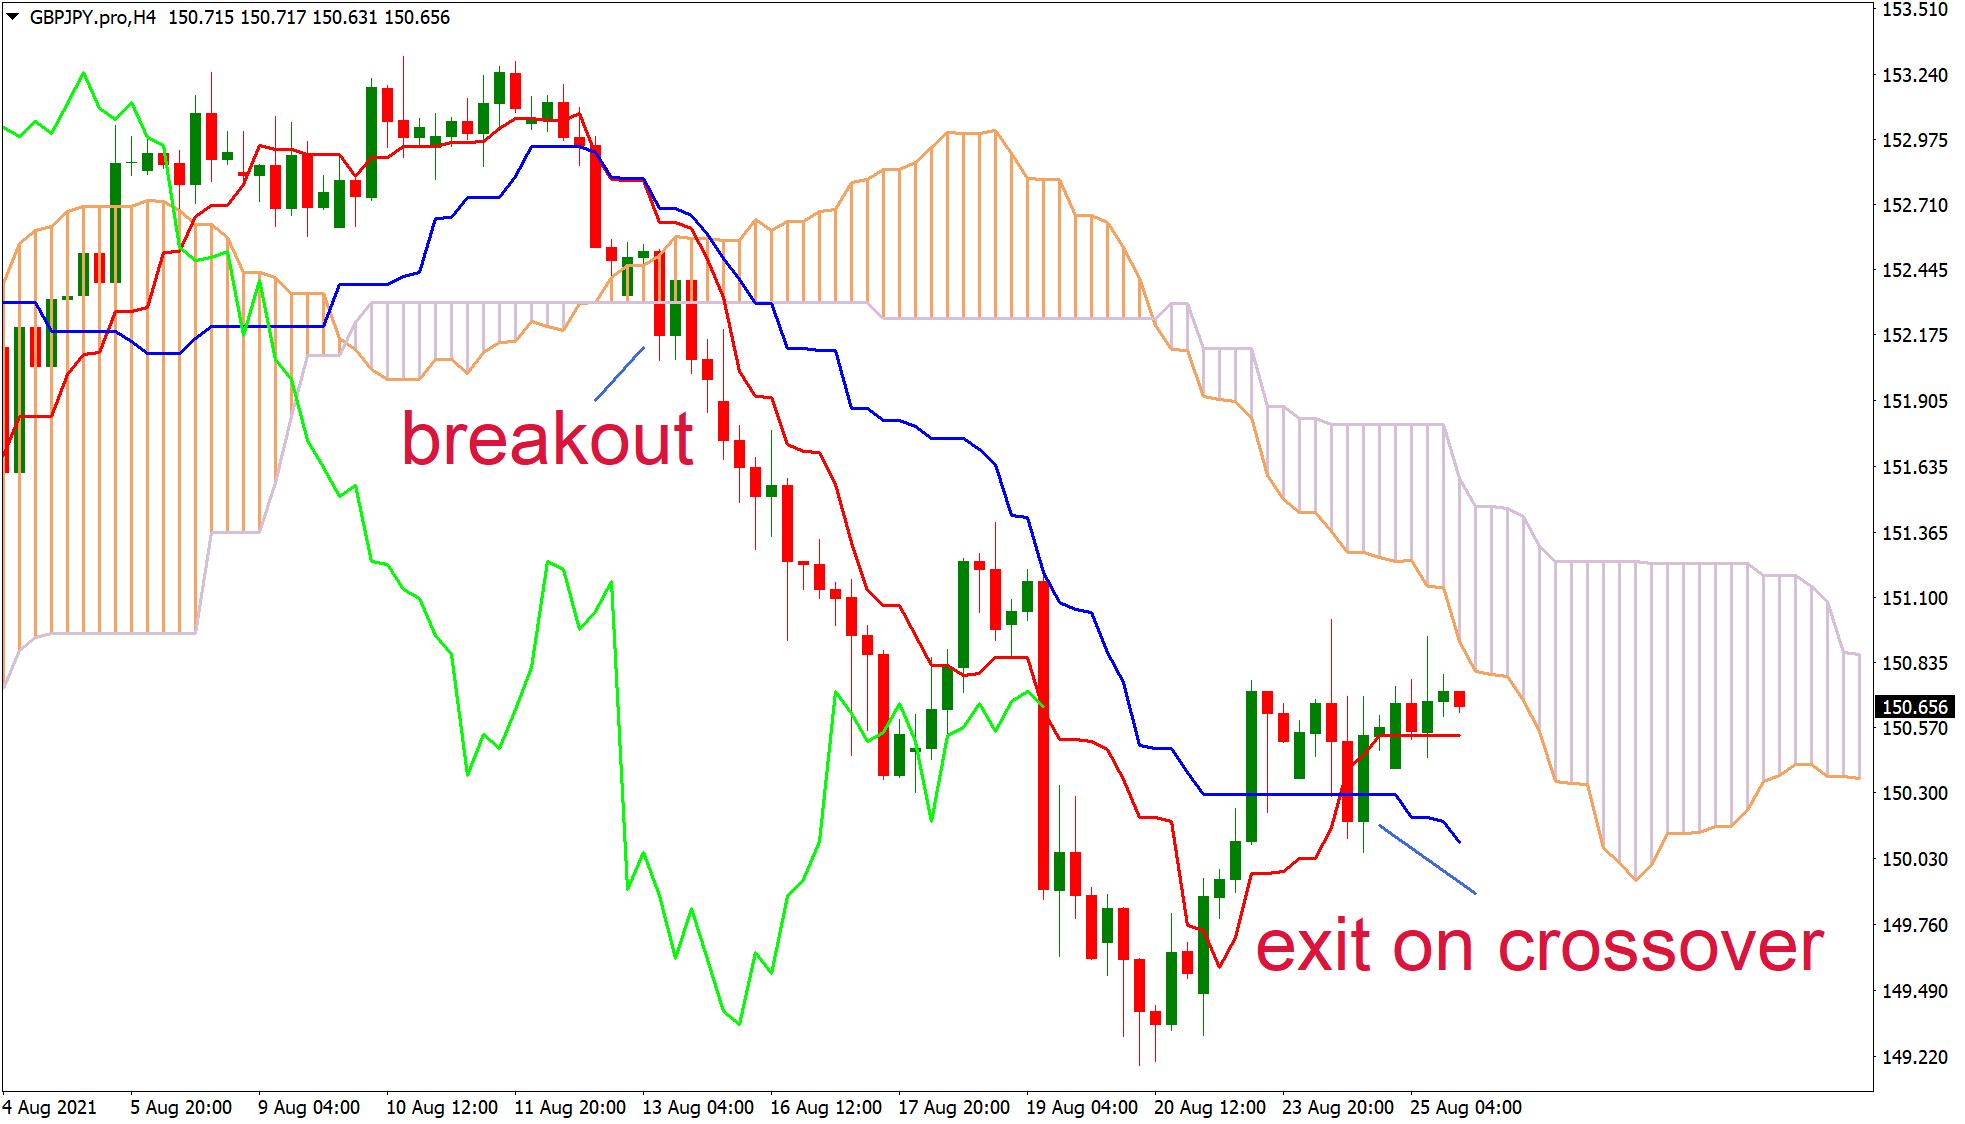 Breakout entry example using ichimoku cloud indicator